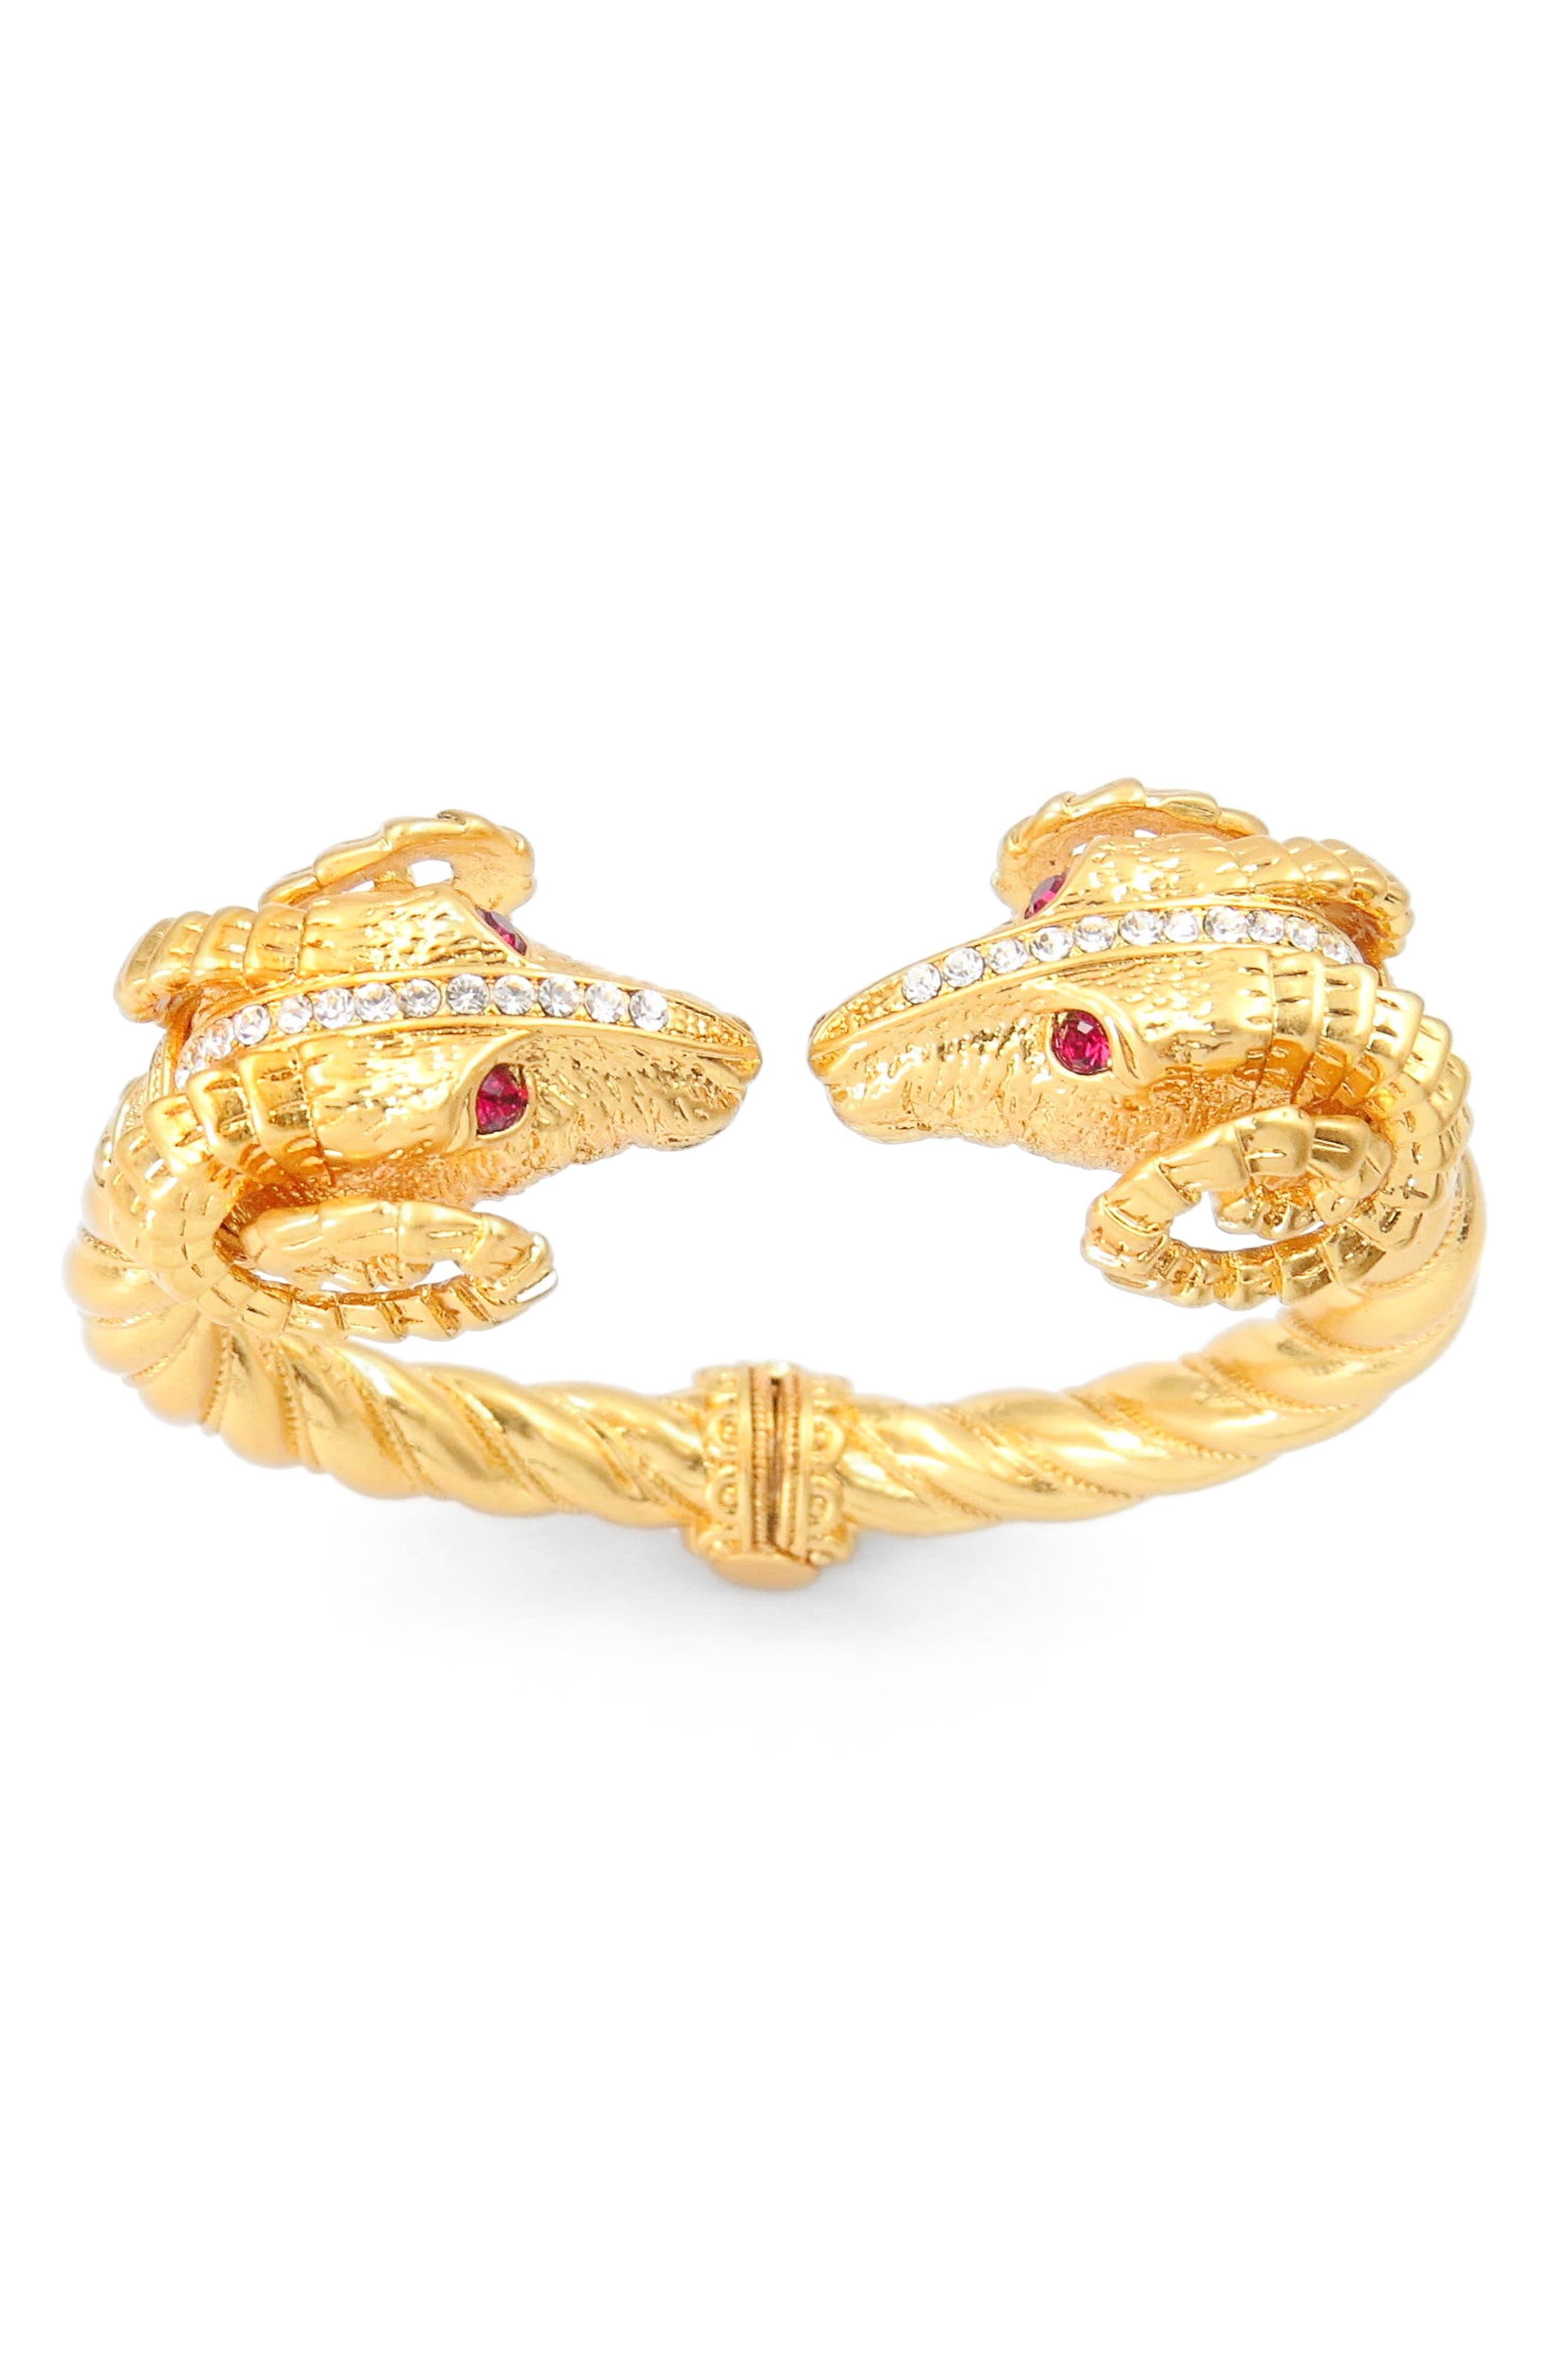 Asa Kaftans Ram Head Cuff Bracelet